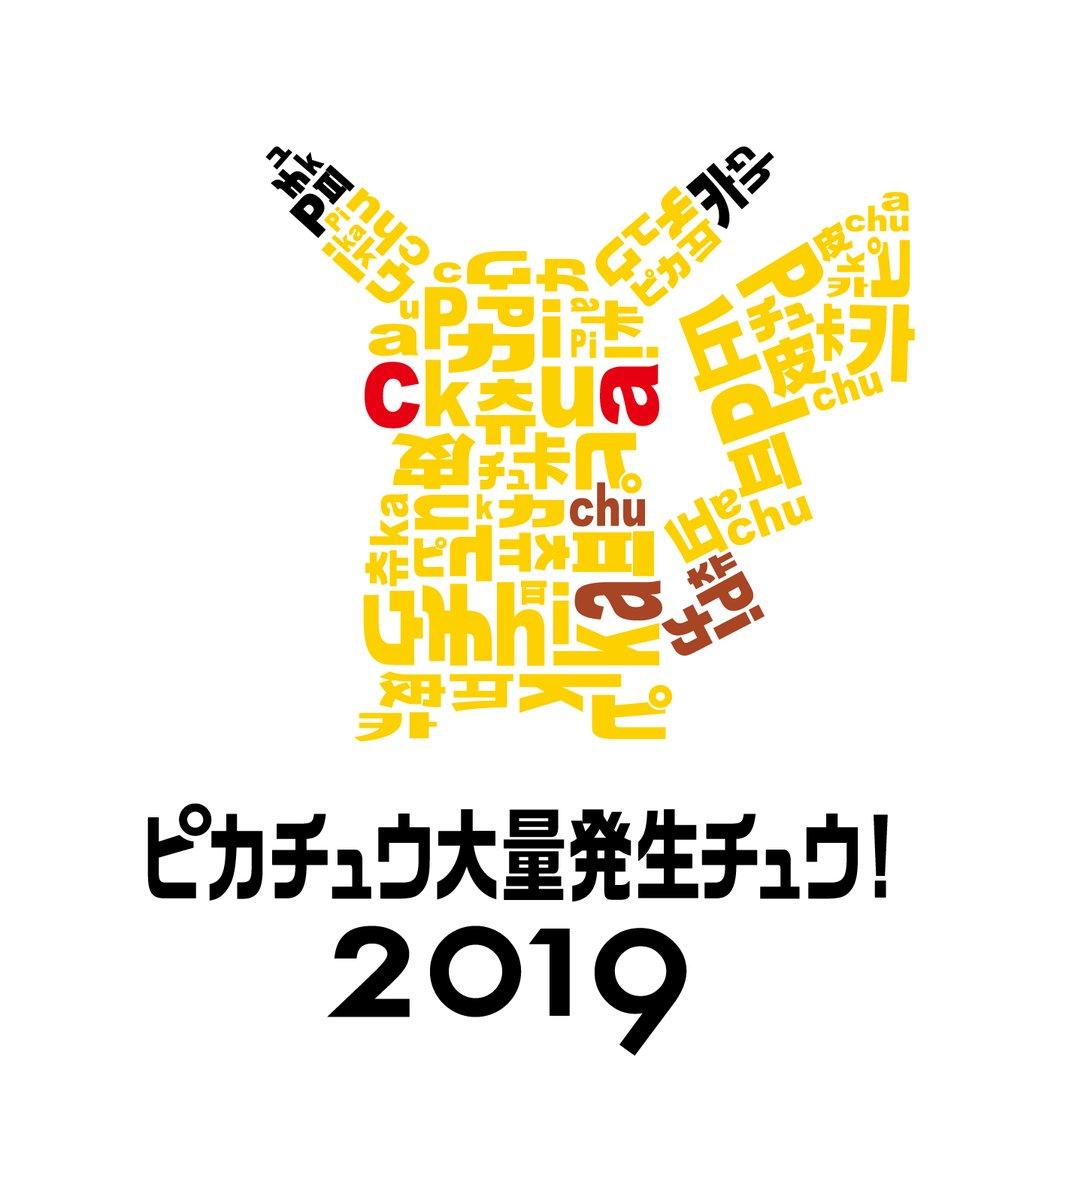 Pikachu Outbreak festival 2019